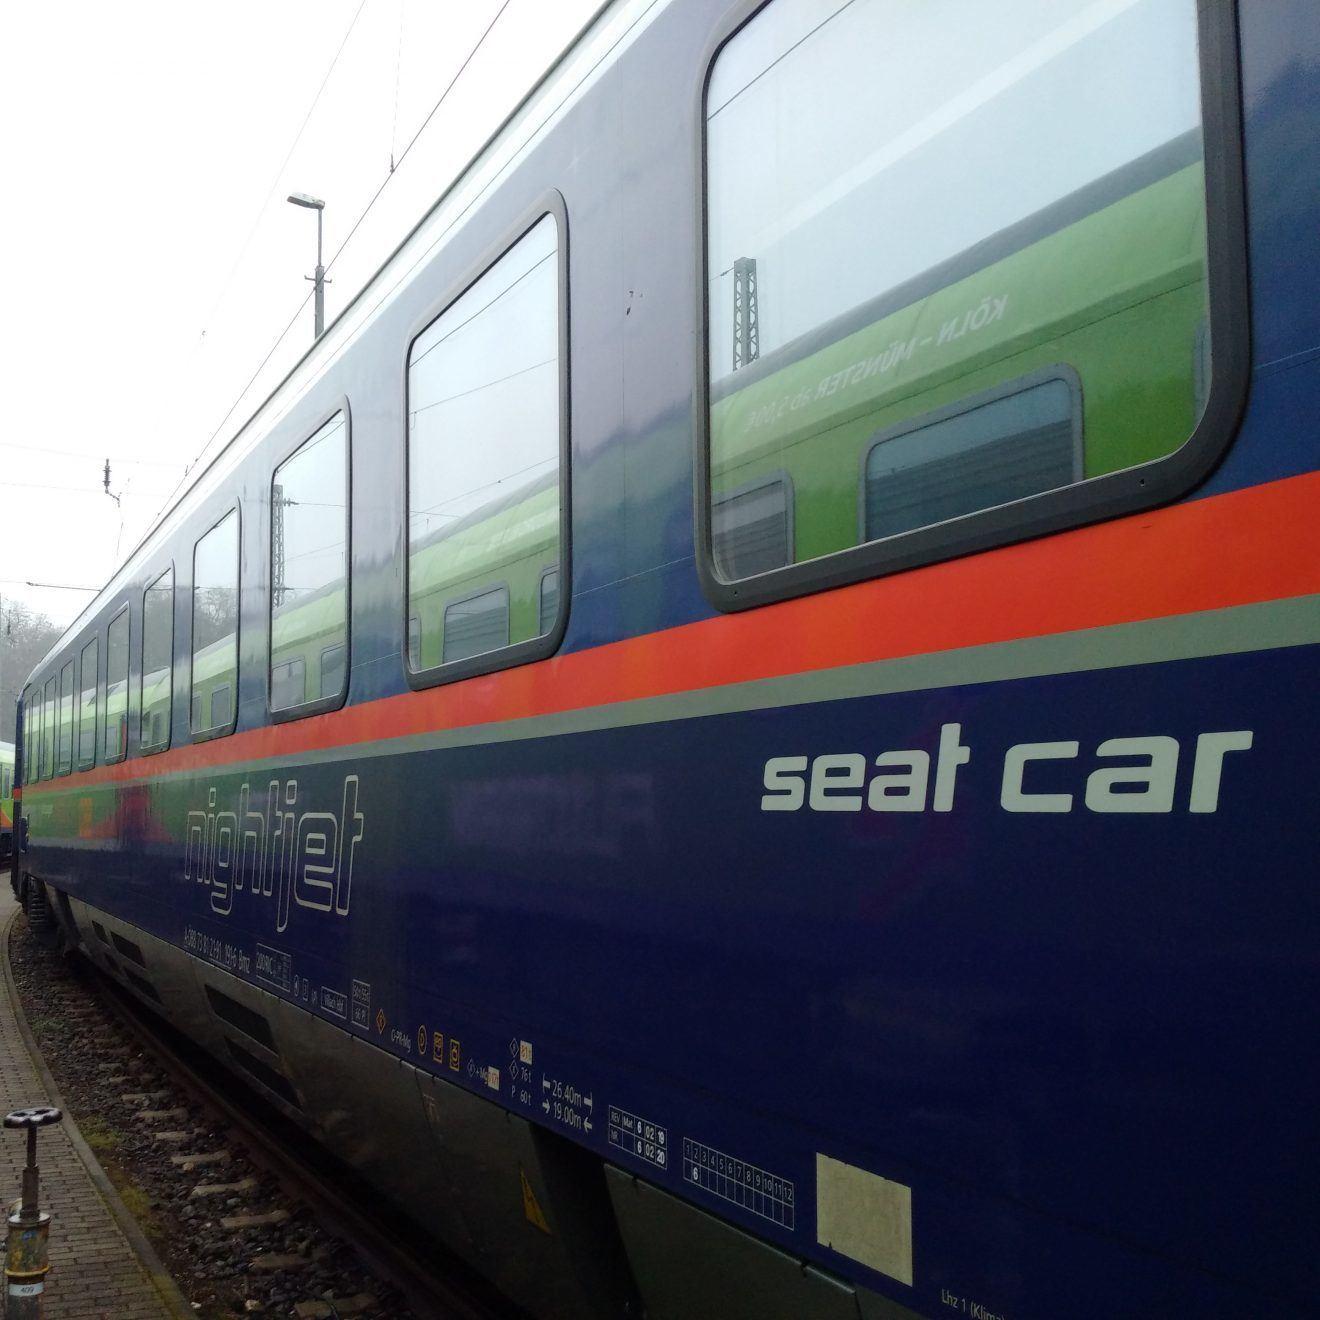 European Night Train Seated Car